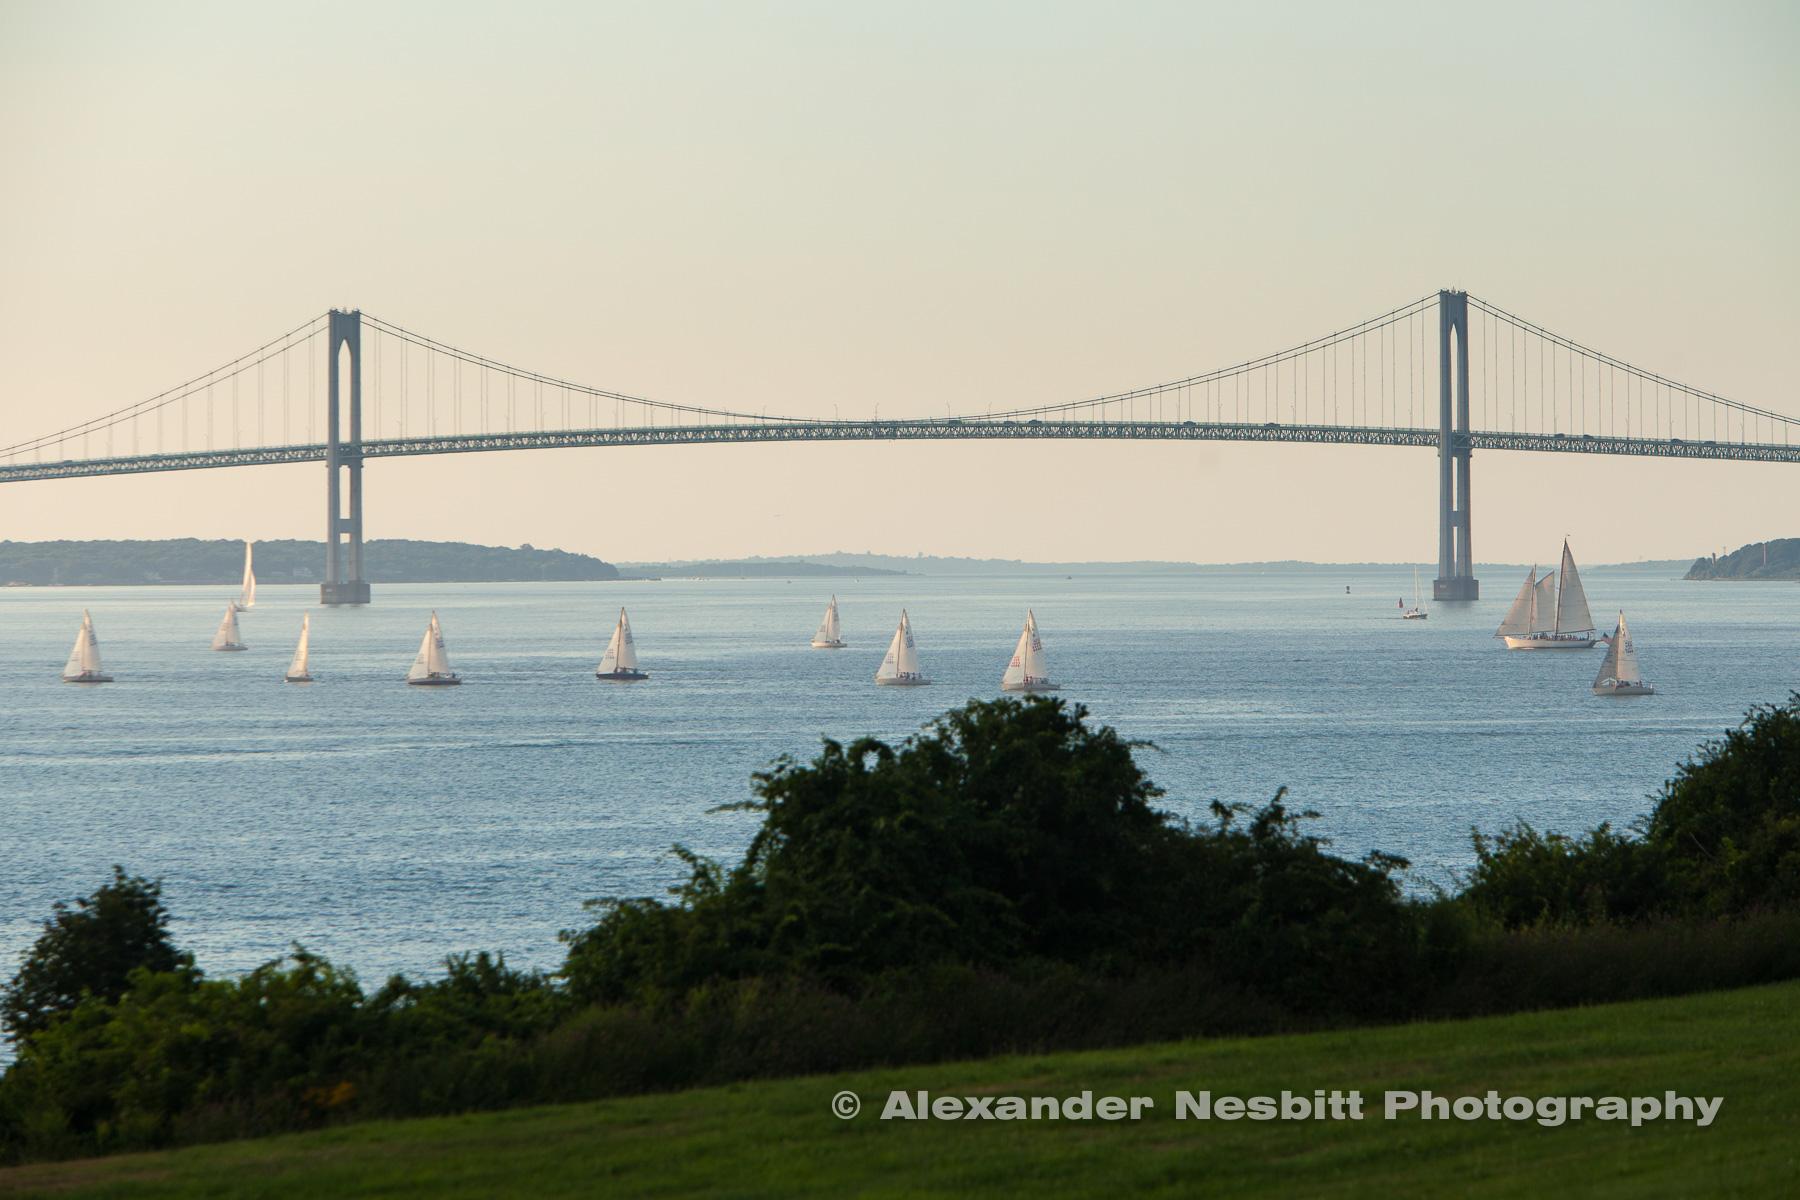 J24s race by the Newport Bridge